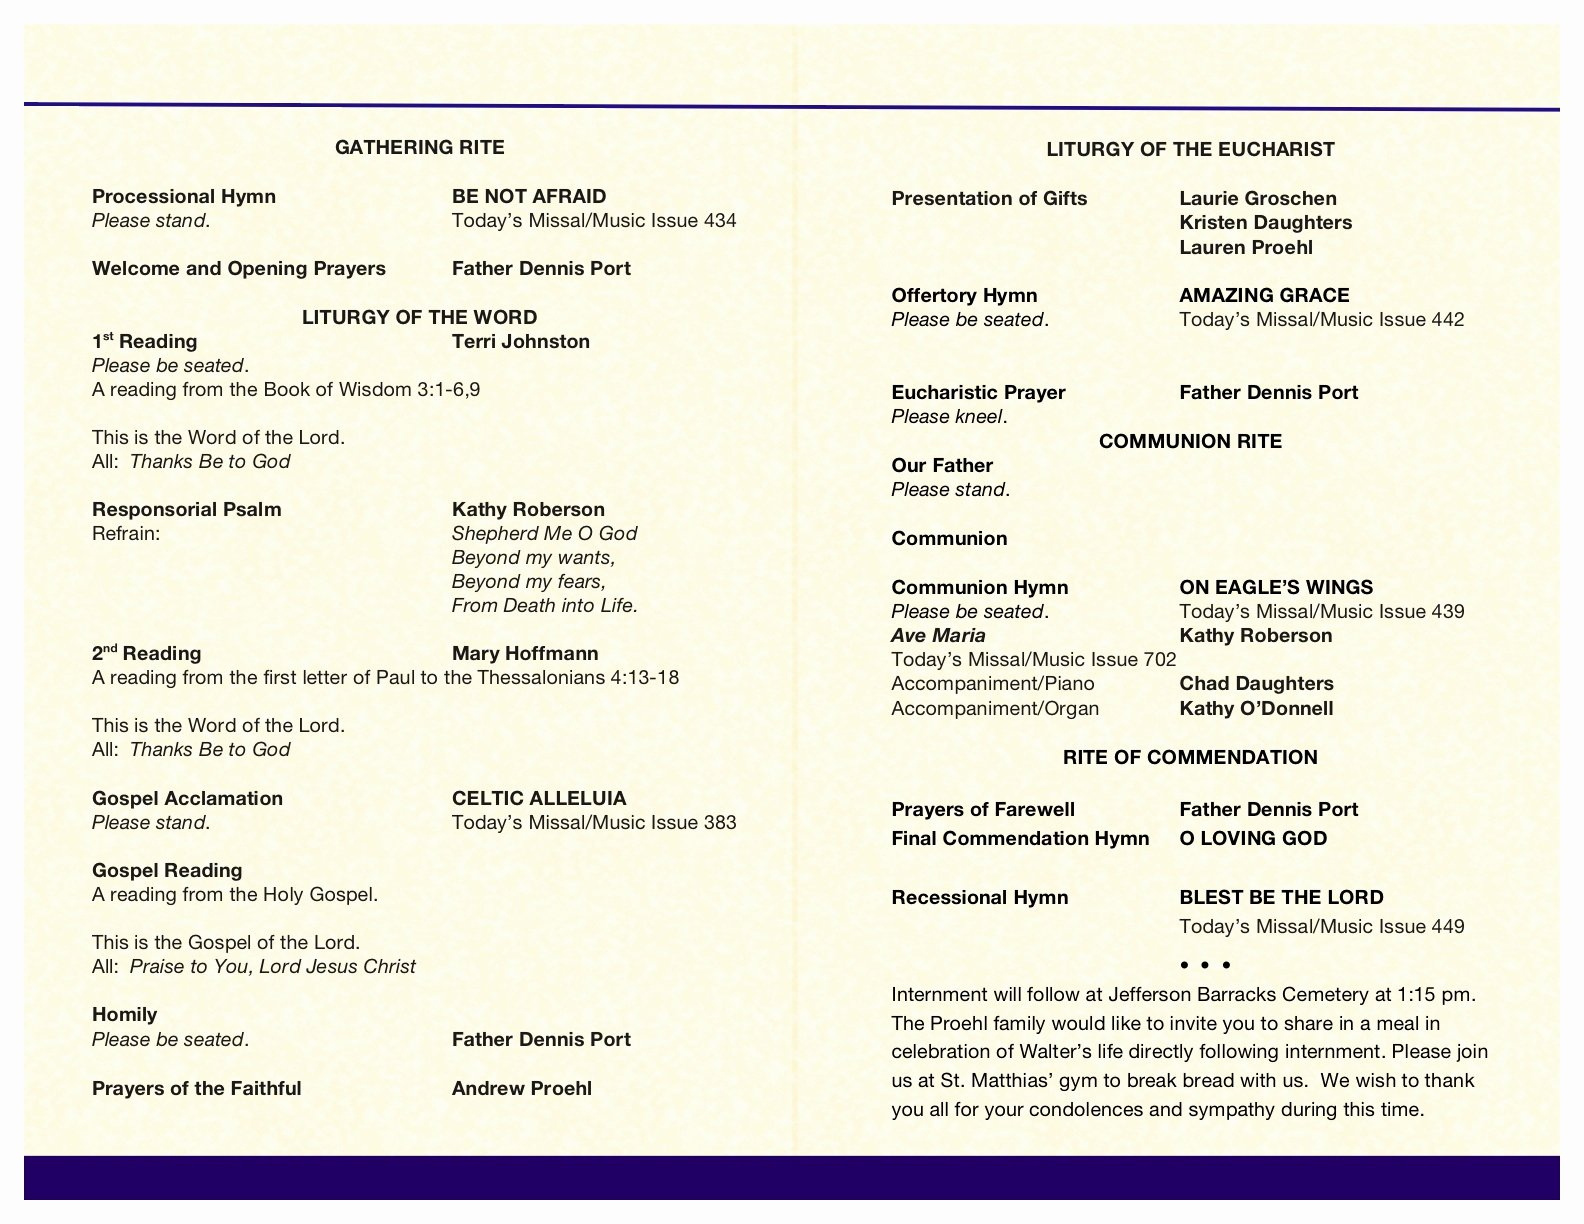 Funeral Mass Program Template Best Of Wally's Funeral Mass Booklet